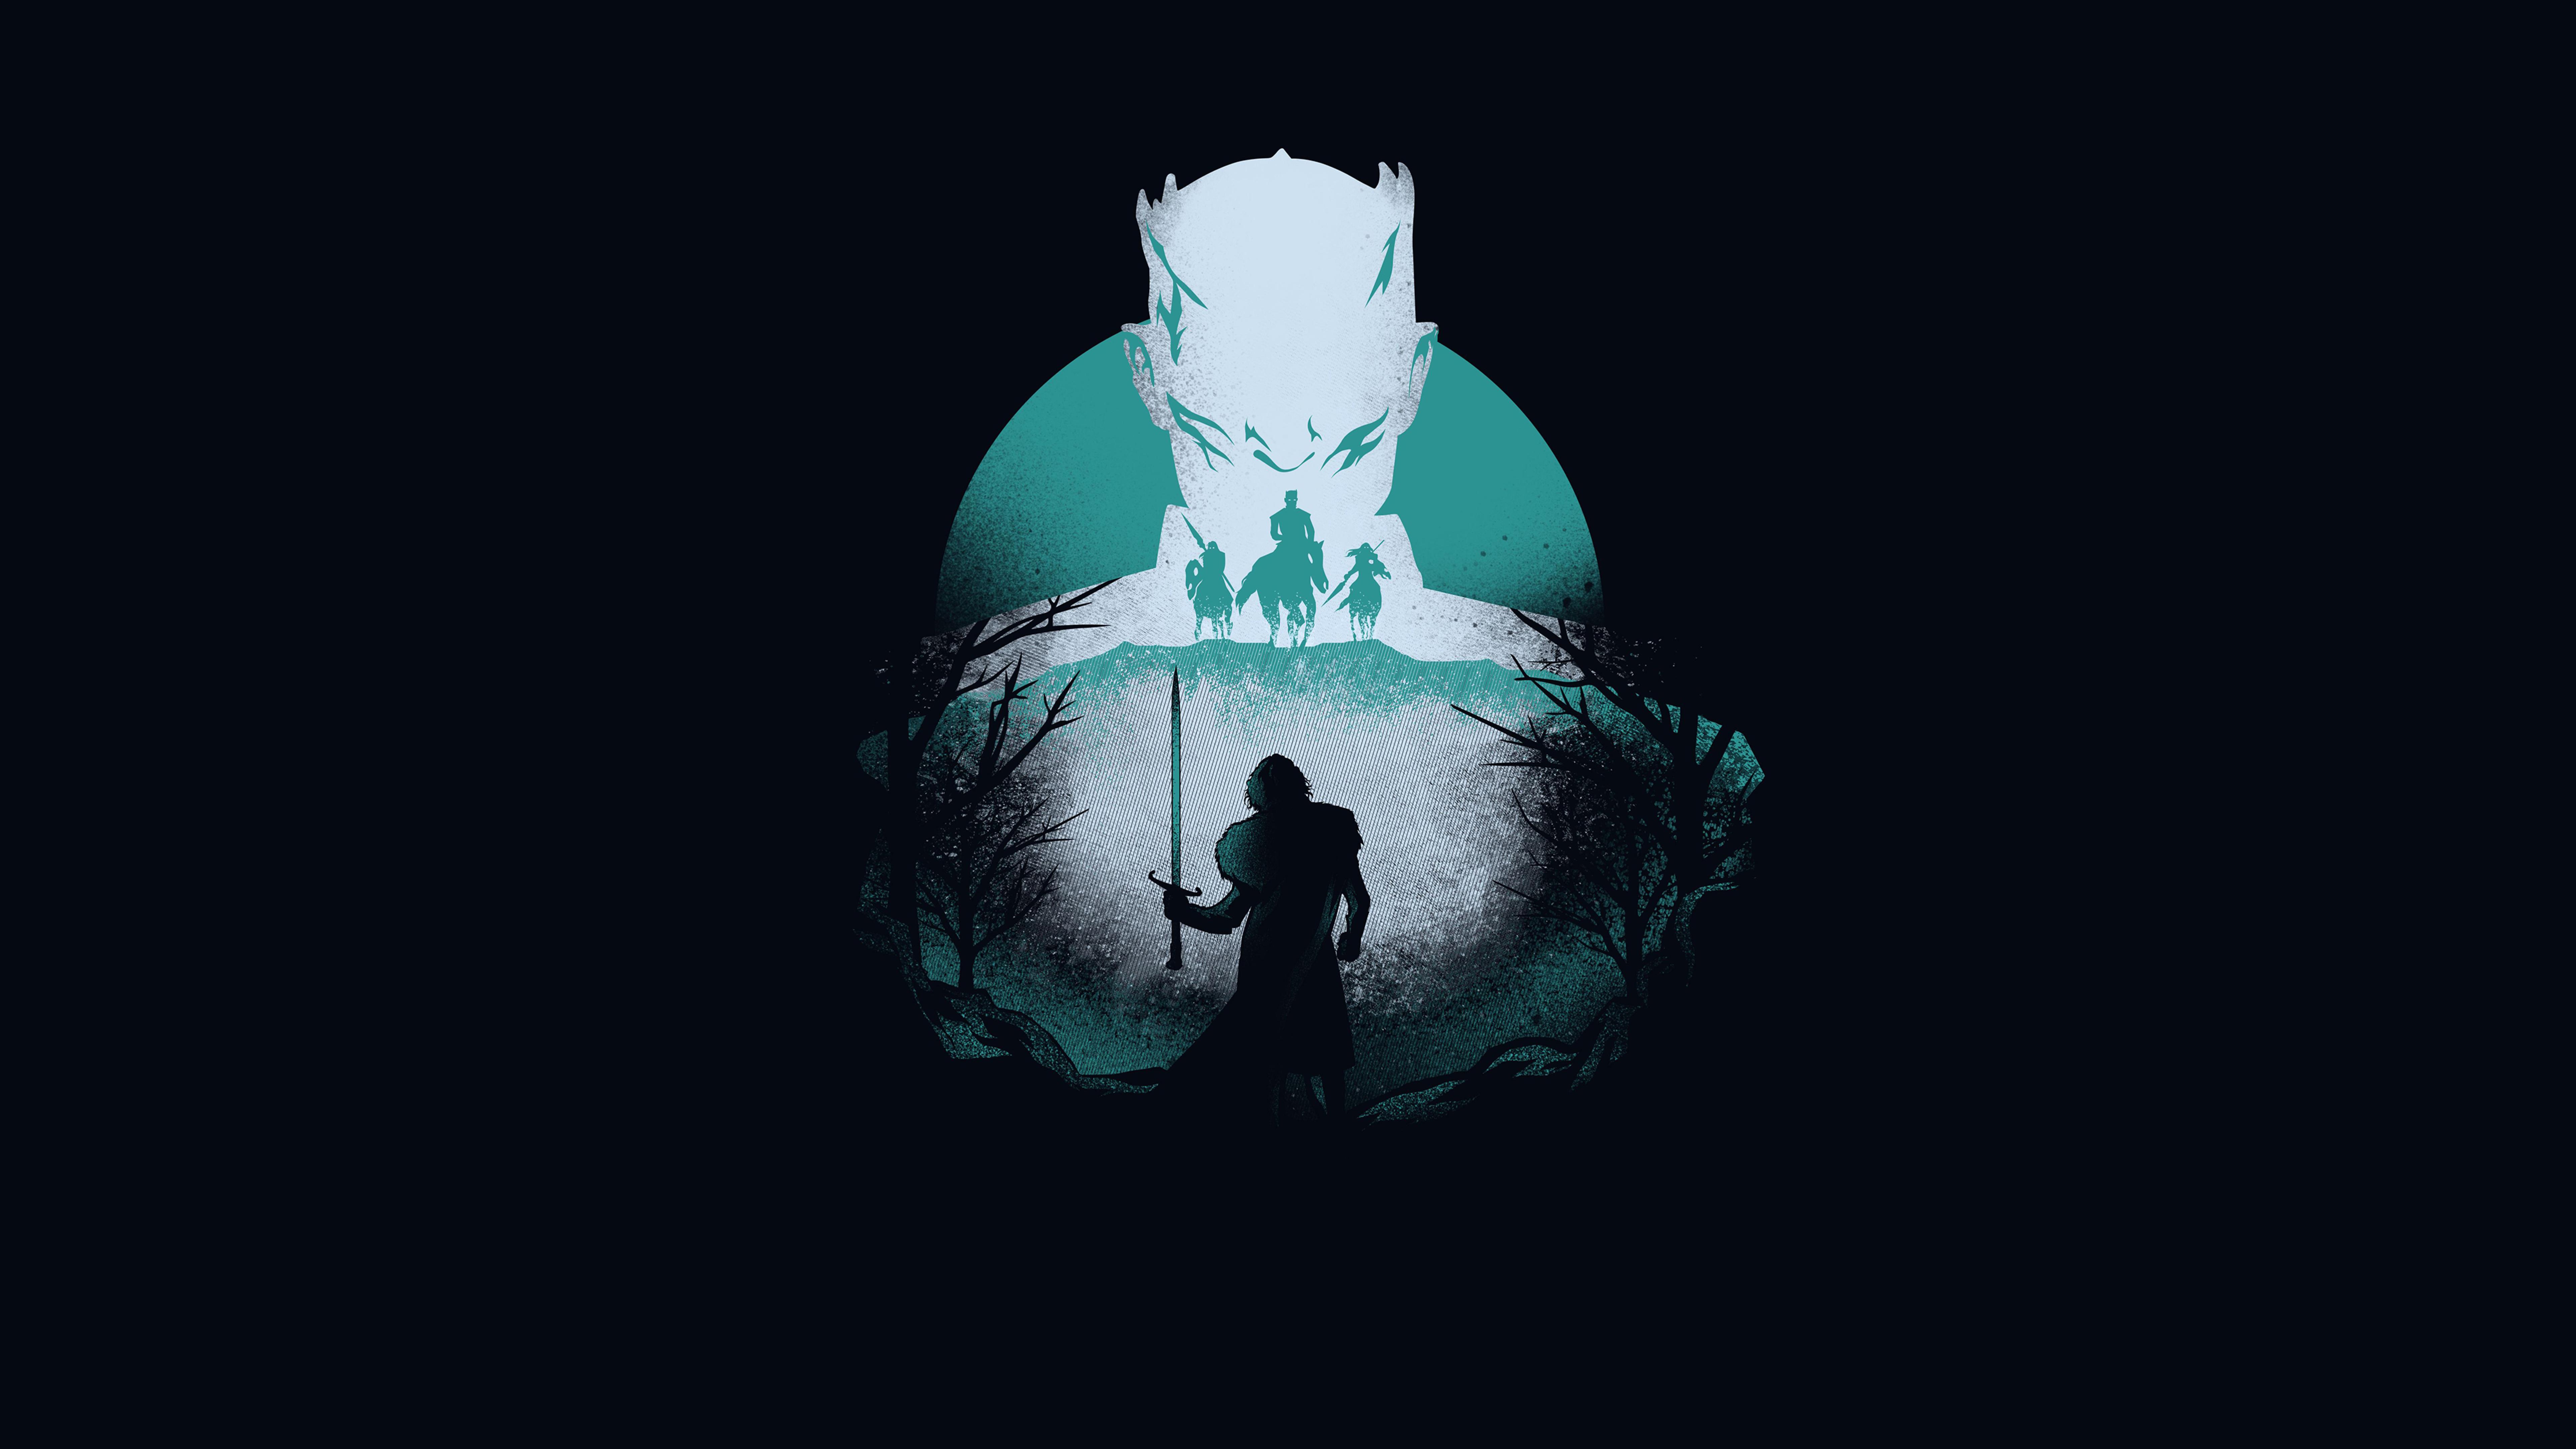 7680x4320 Night King Vs Wolf Game Of Thrones 8 Artwork 8k